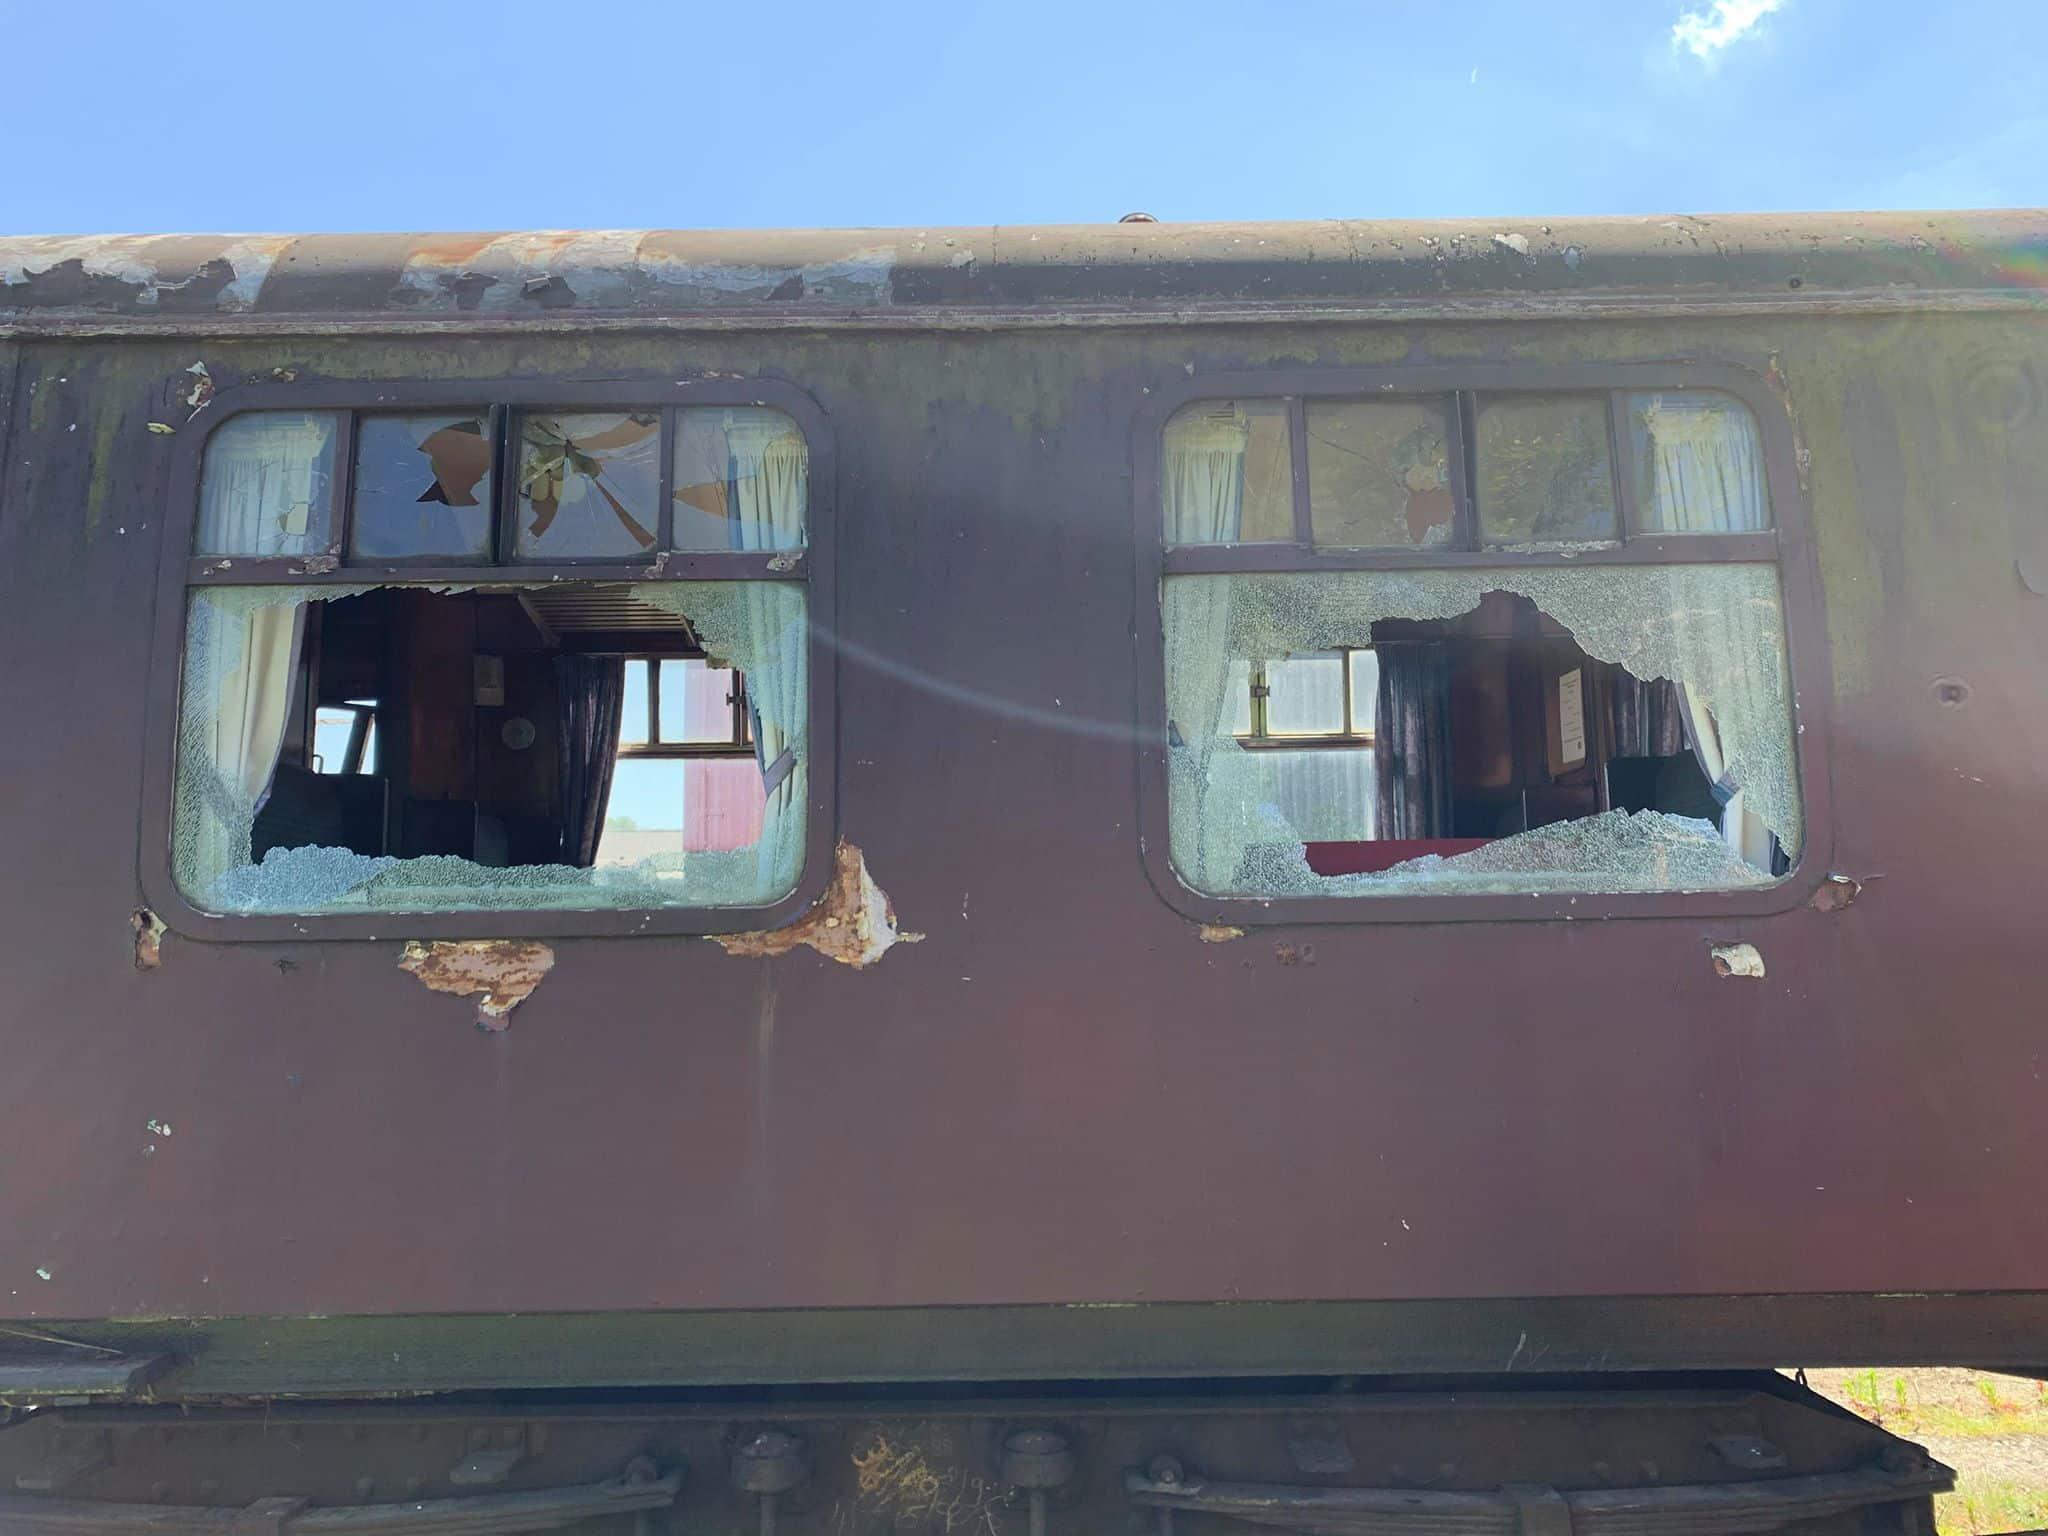 Vandalism at the Midland Railway - Butterley